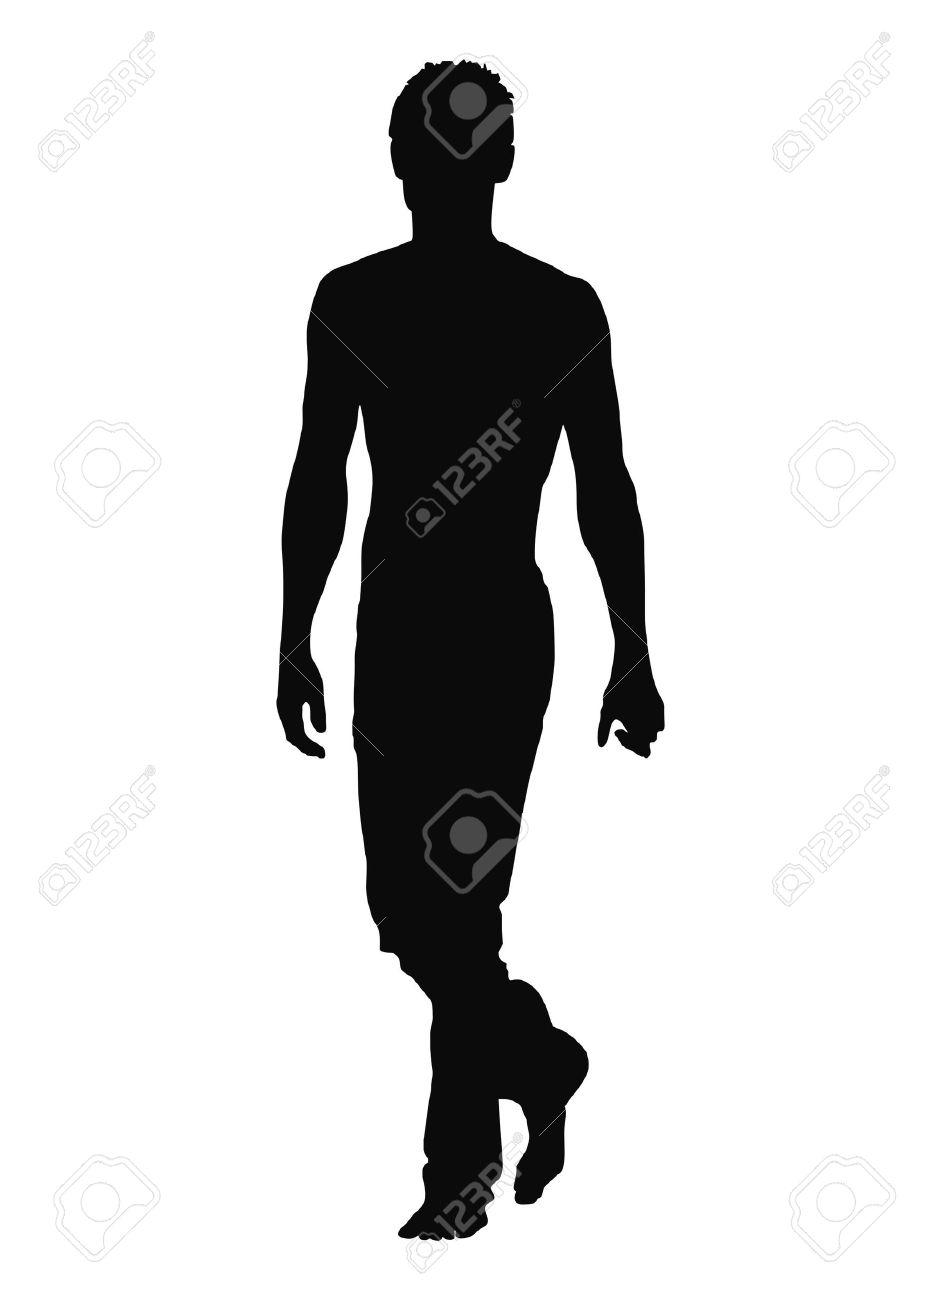 Silhouette of walking man. Vector illustration. - 11474877